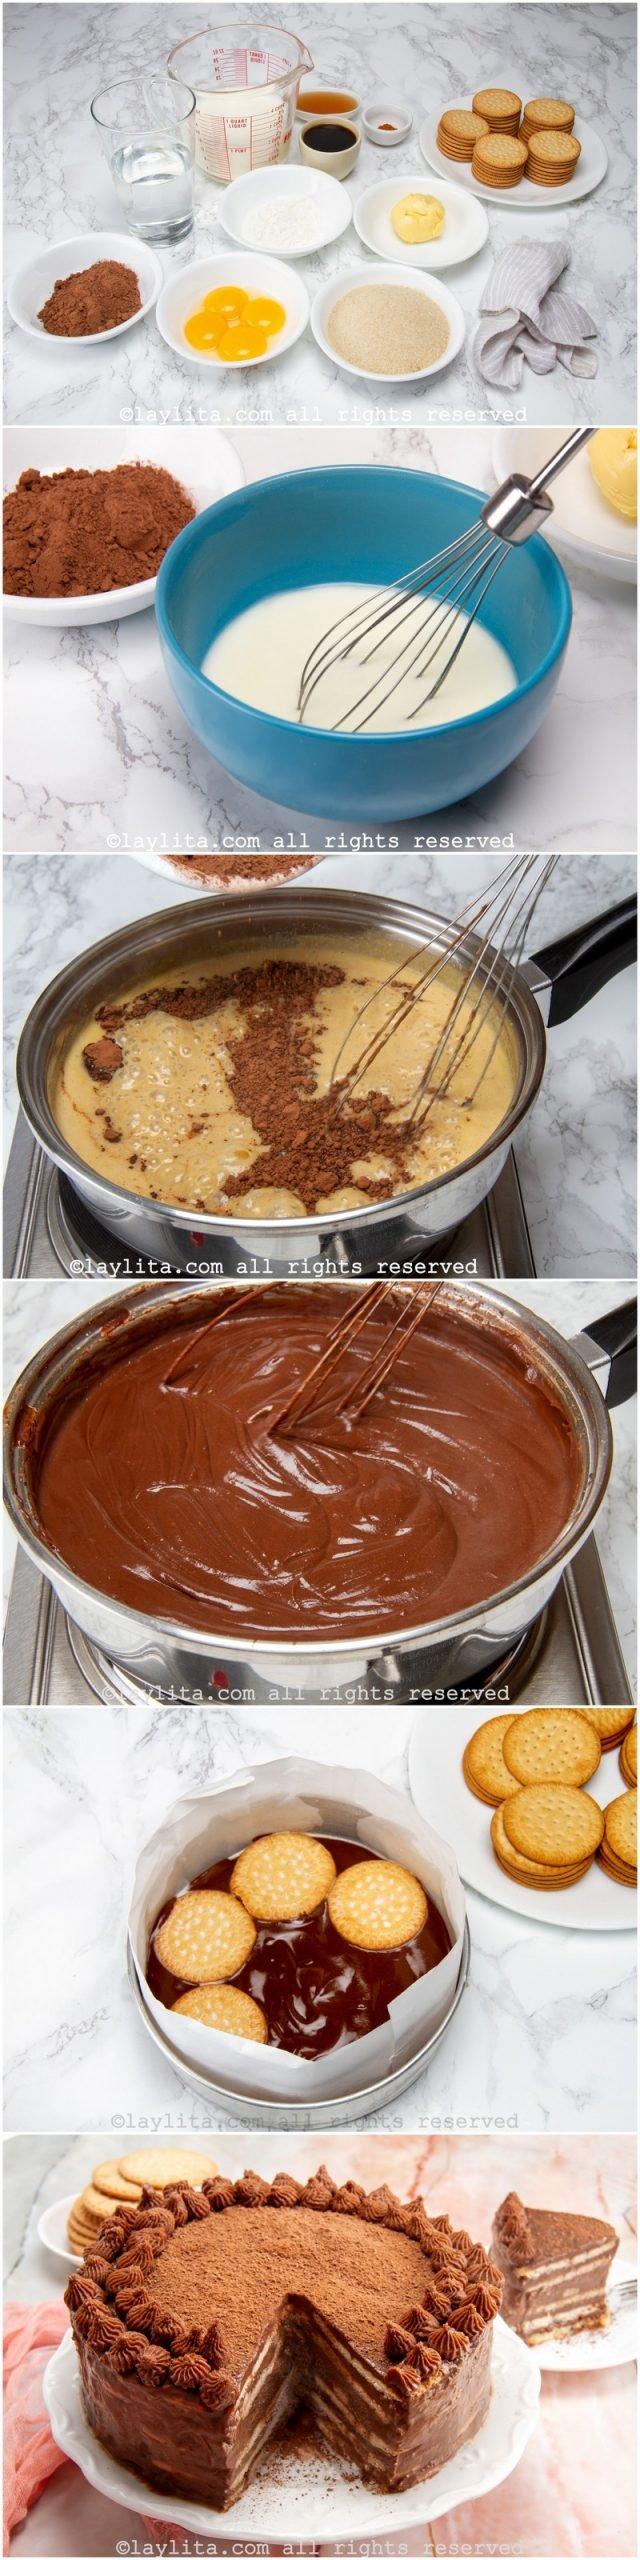 Como preparar la marquesa de chocolate venezolana - paso a paso